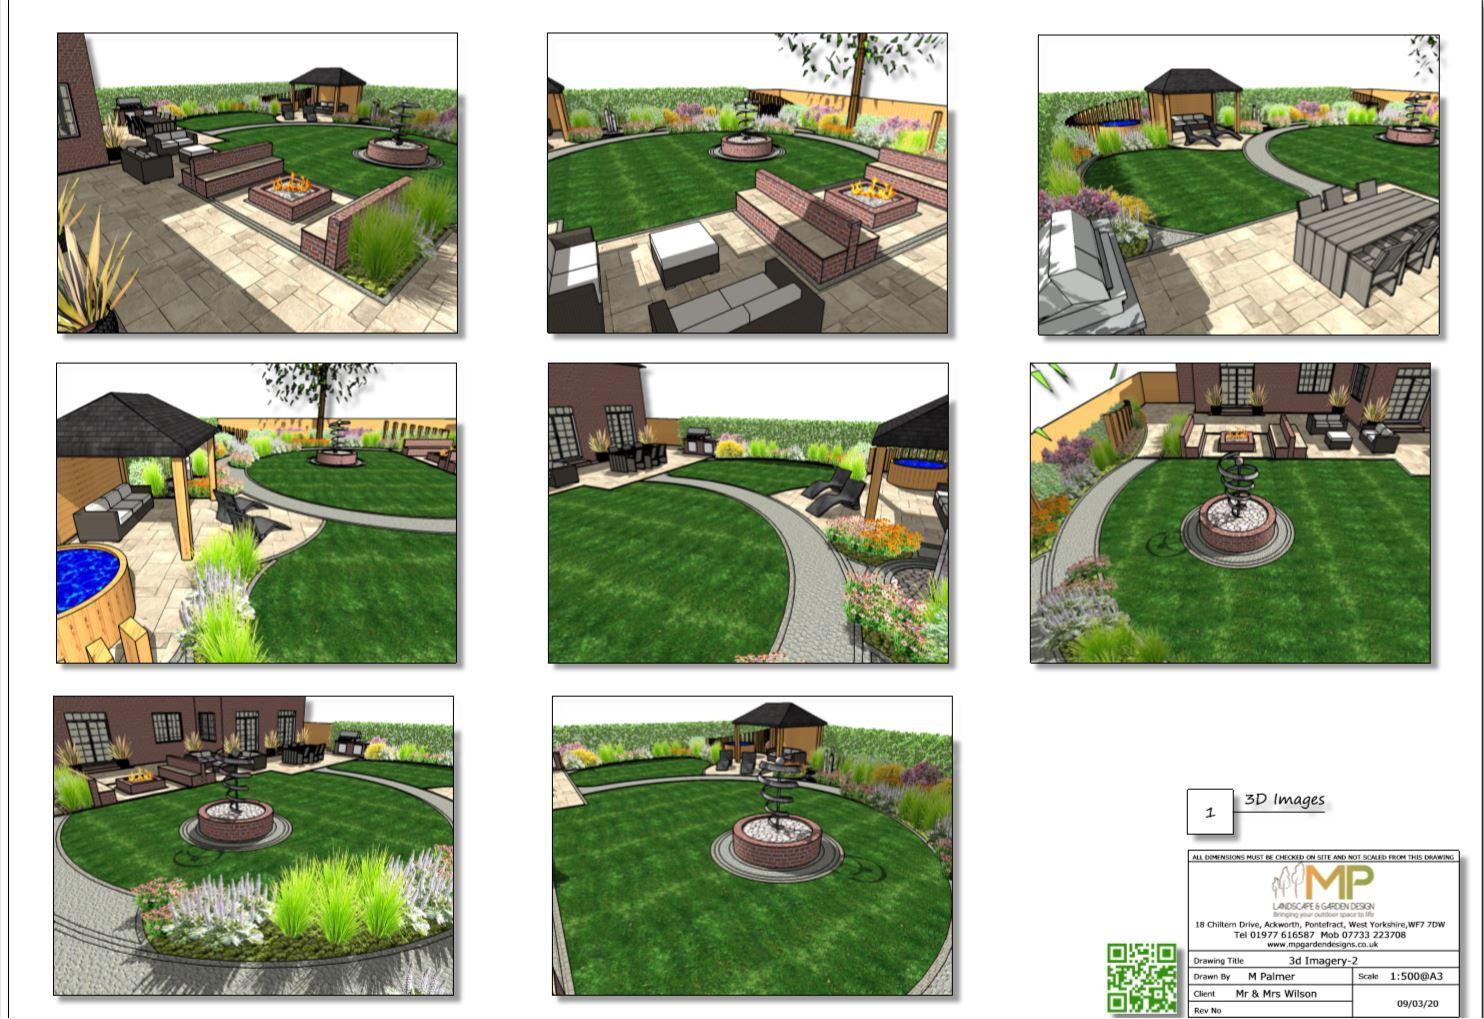 2.Garden layout plan, 3D images Wakefield.